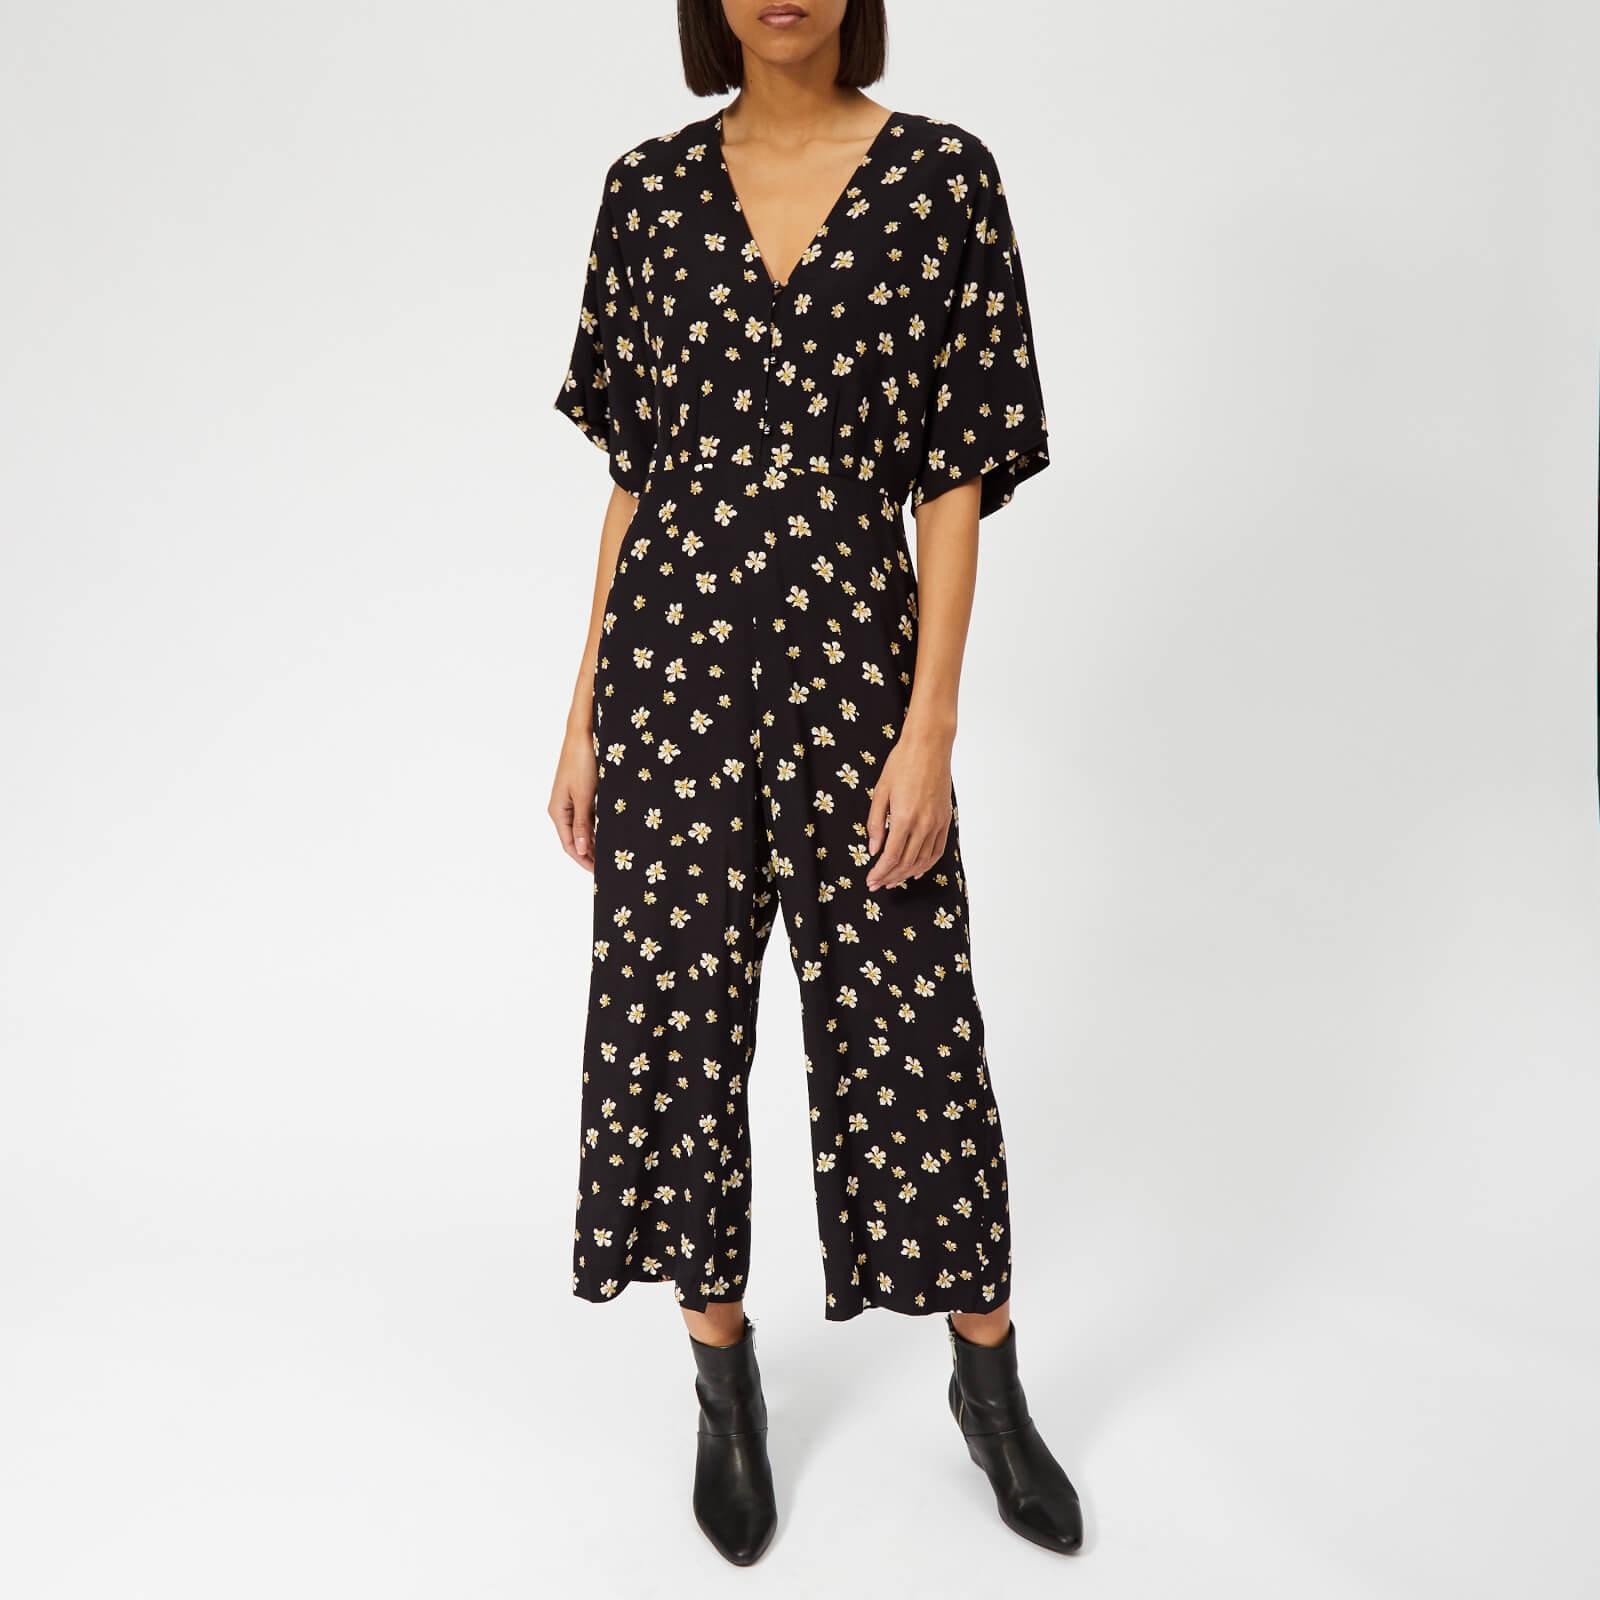 4301a53e2ac Whistles Women s Edelweiss Print Button Jumpsuit - Black Multi ...